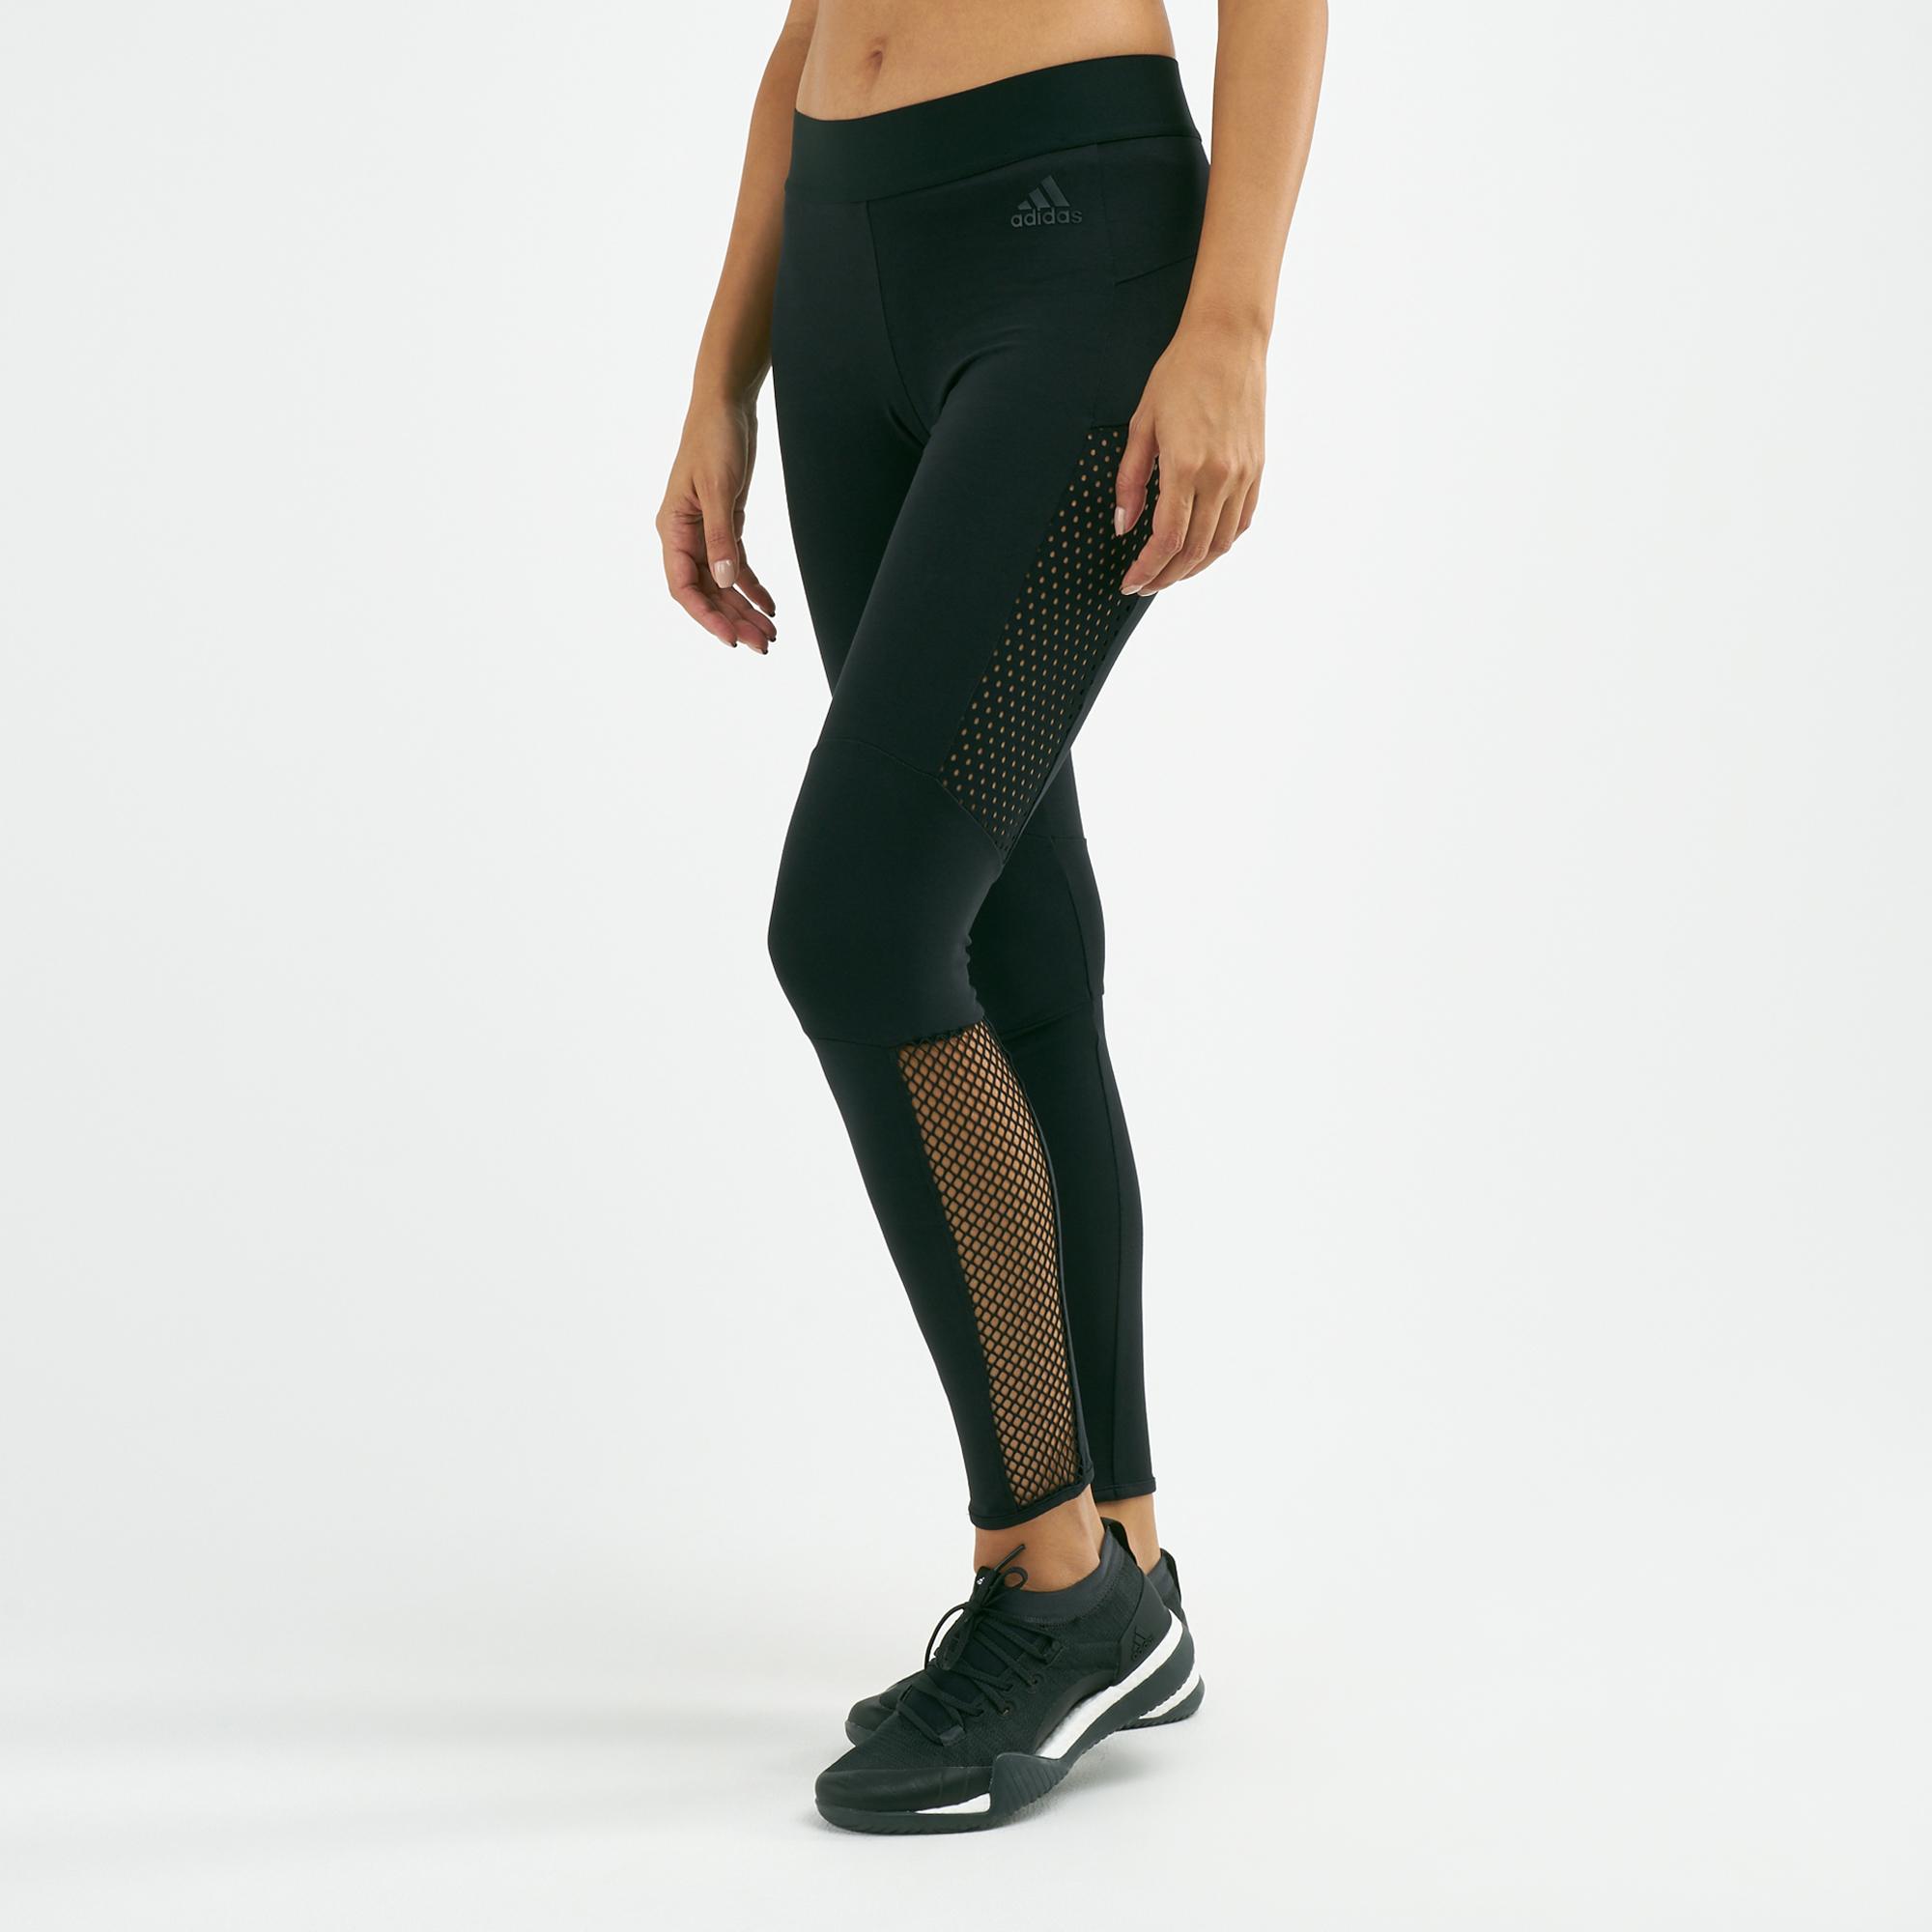 adidas leggings 11-12